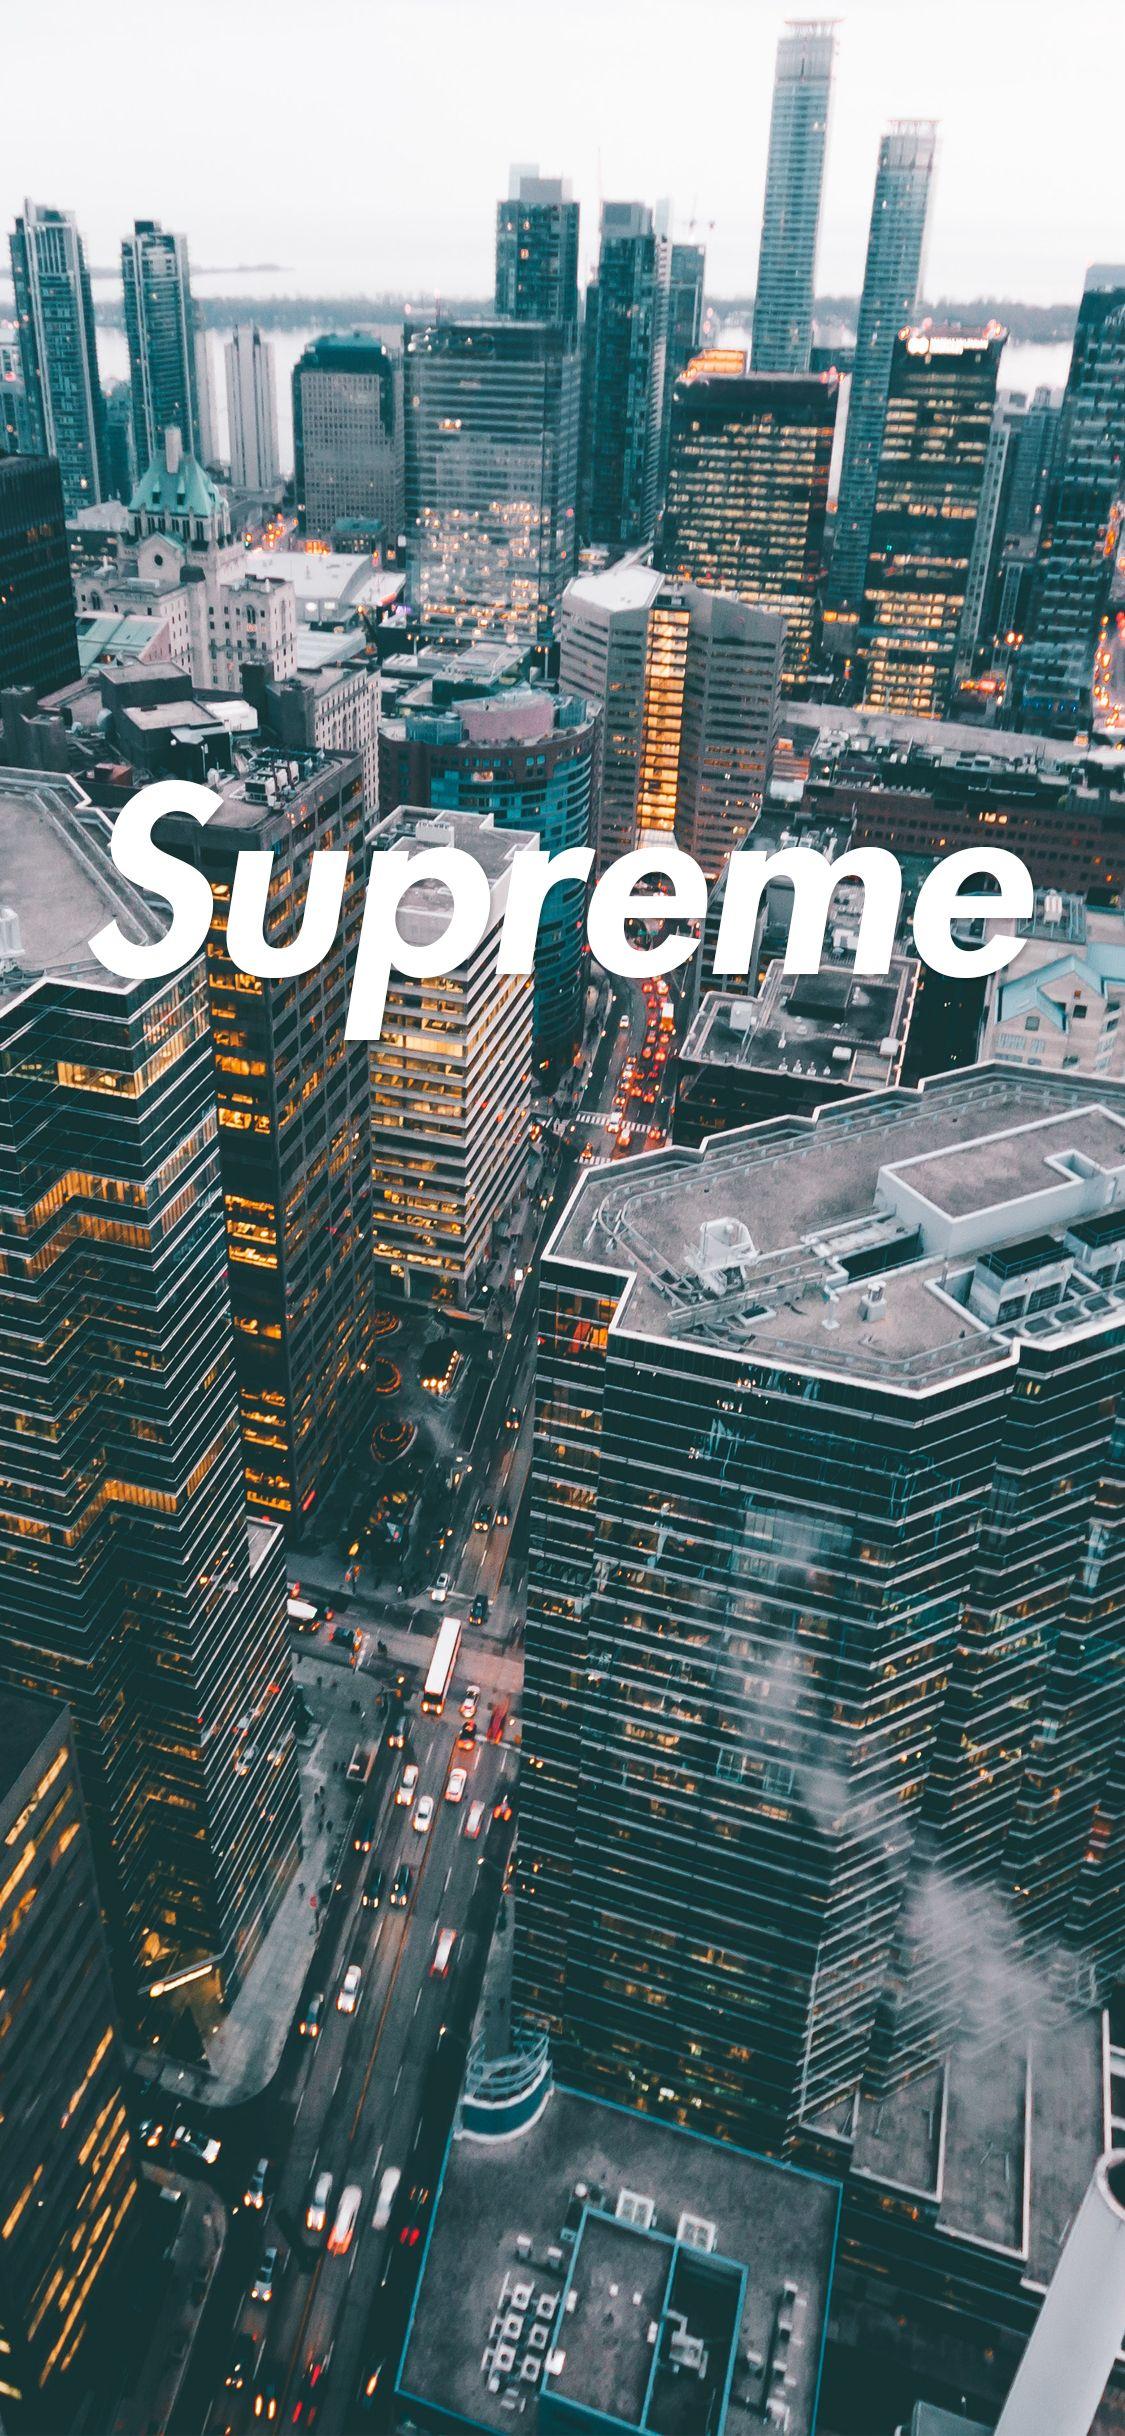 #Supreme #Cool #wallpaper #iphone | Яблоко обои, Обои для телефона, Обои